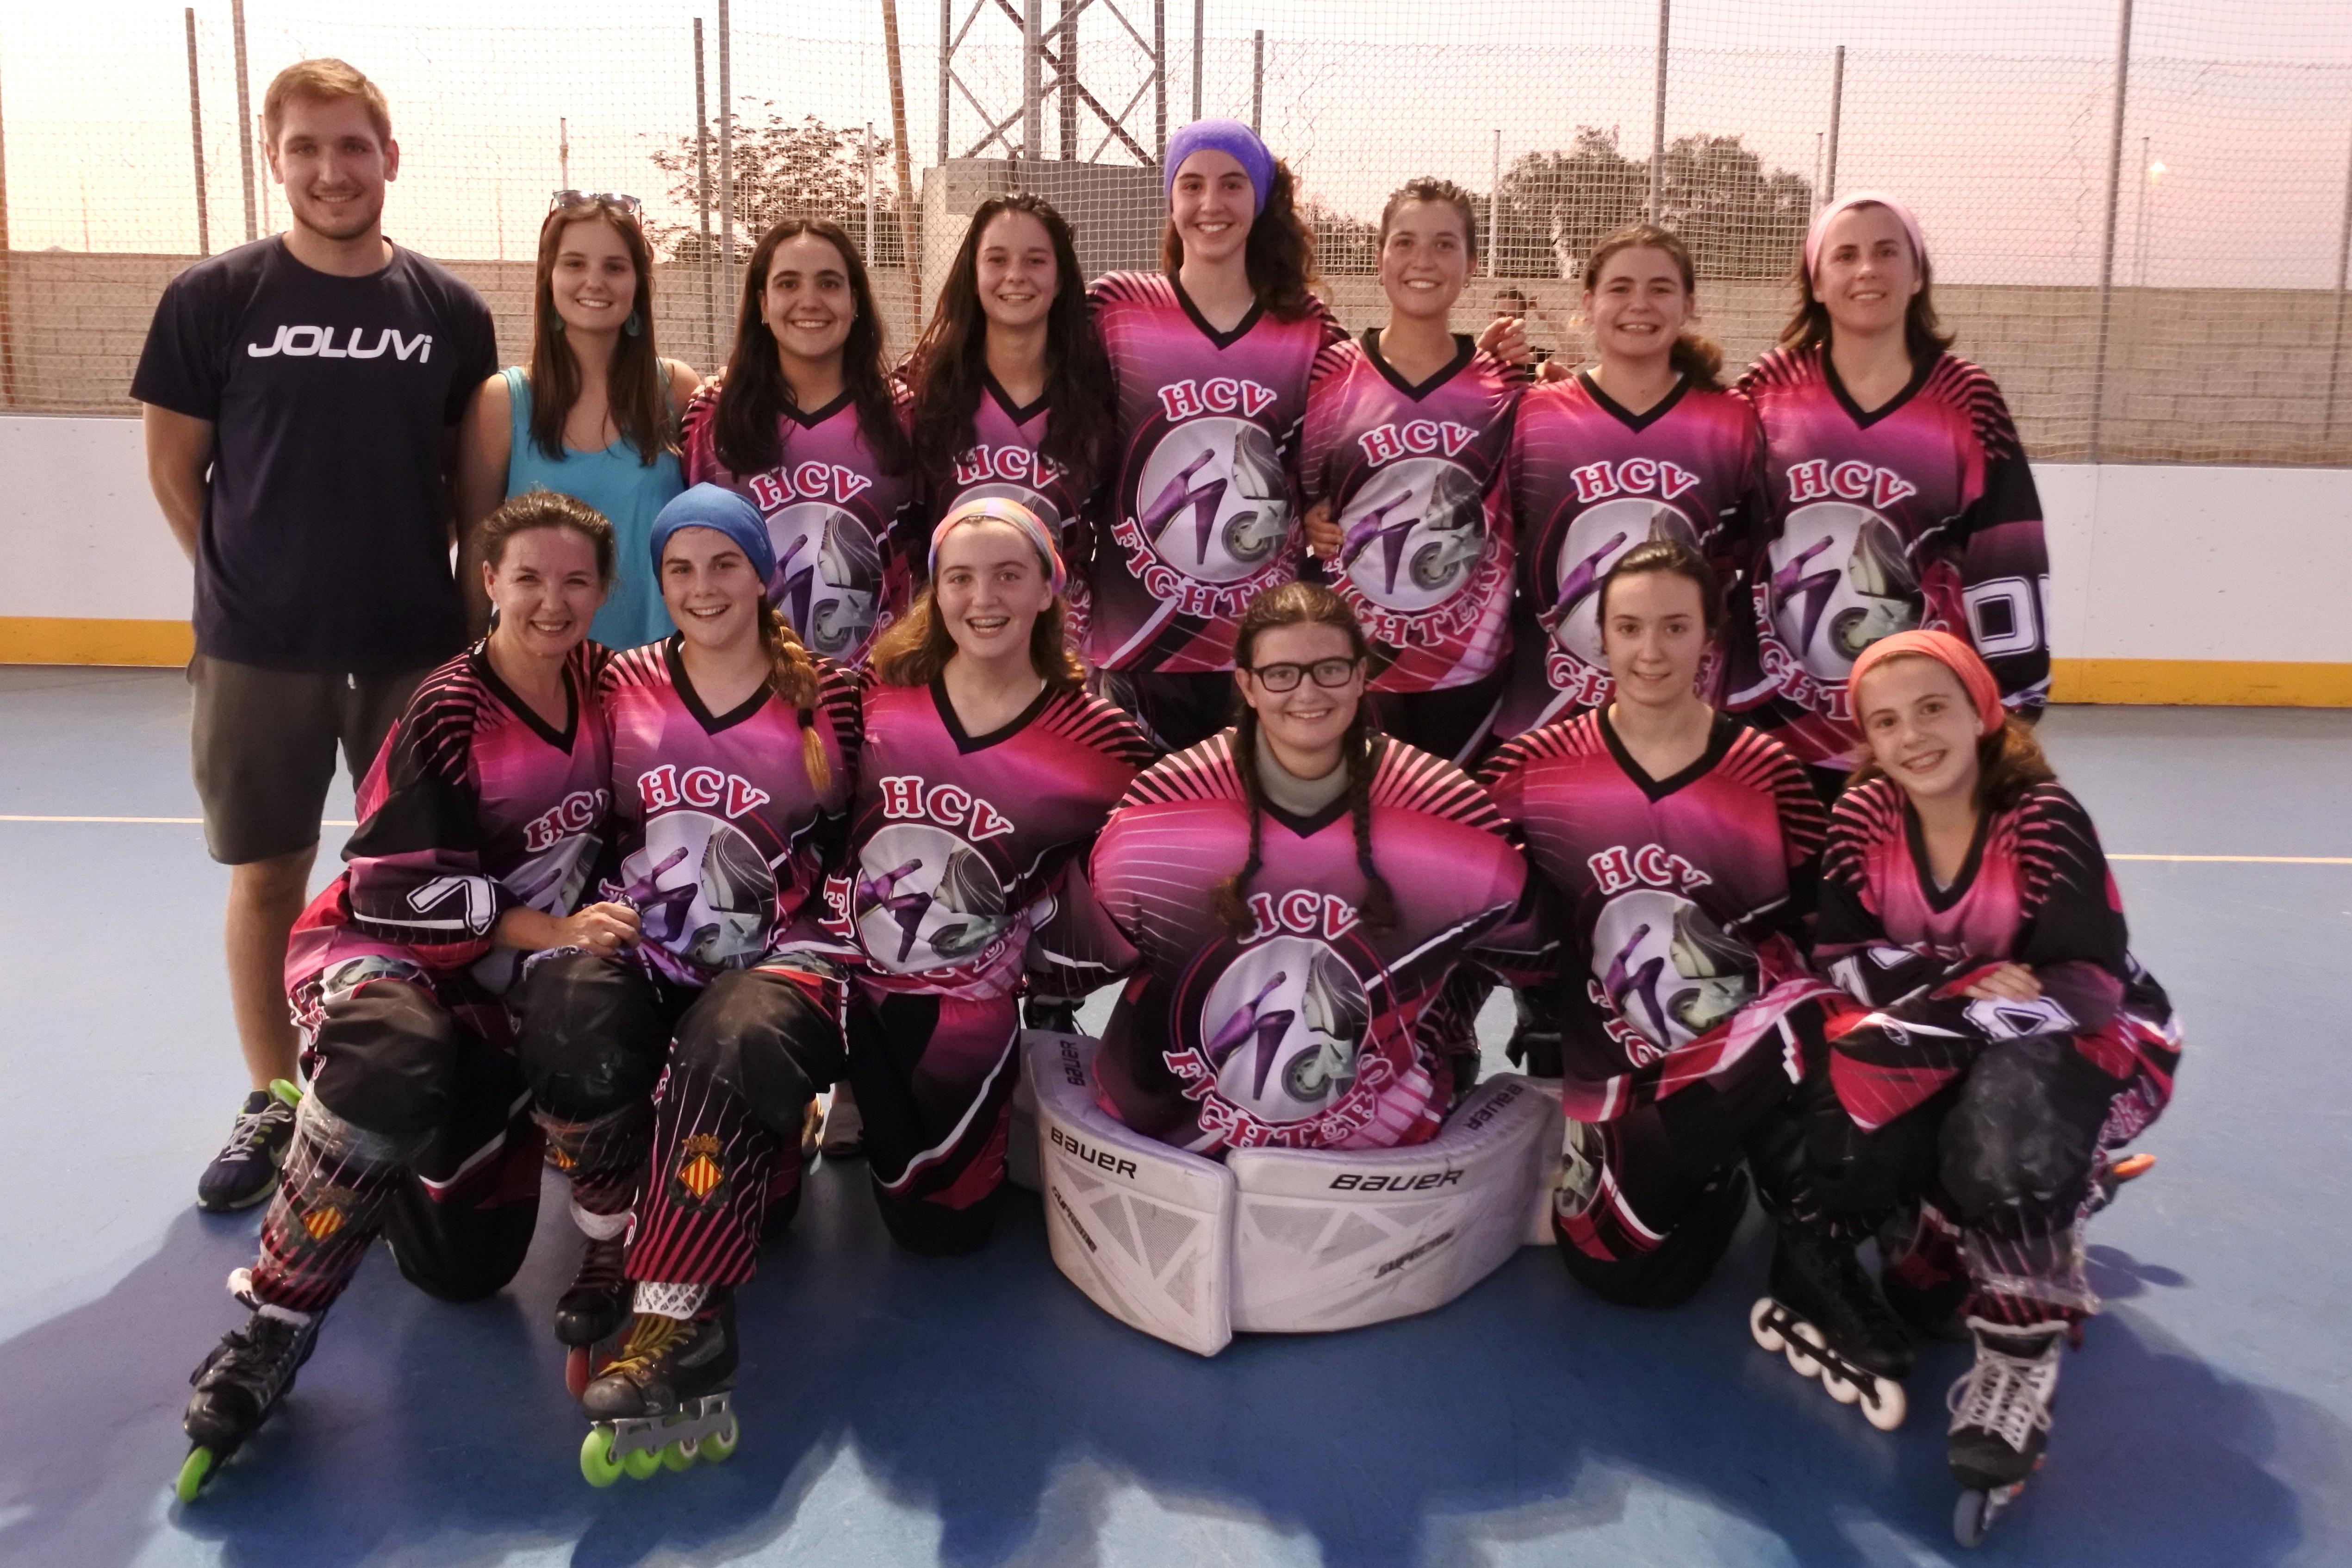 equipo femenino sagunt